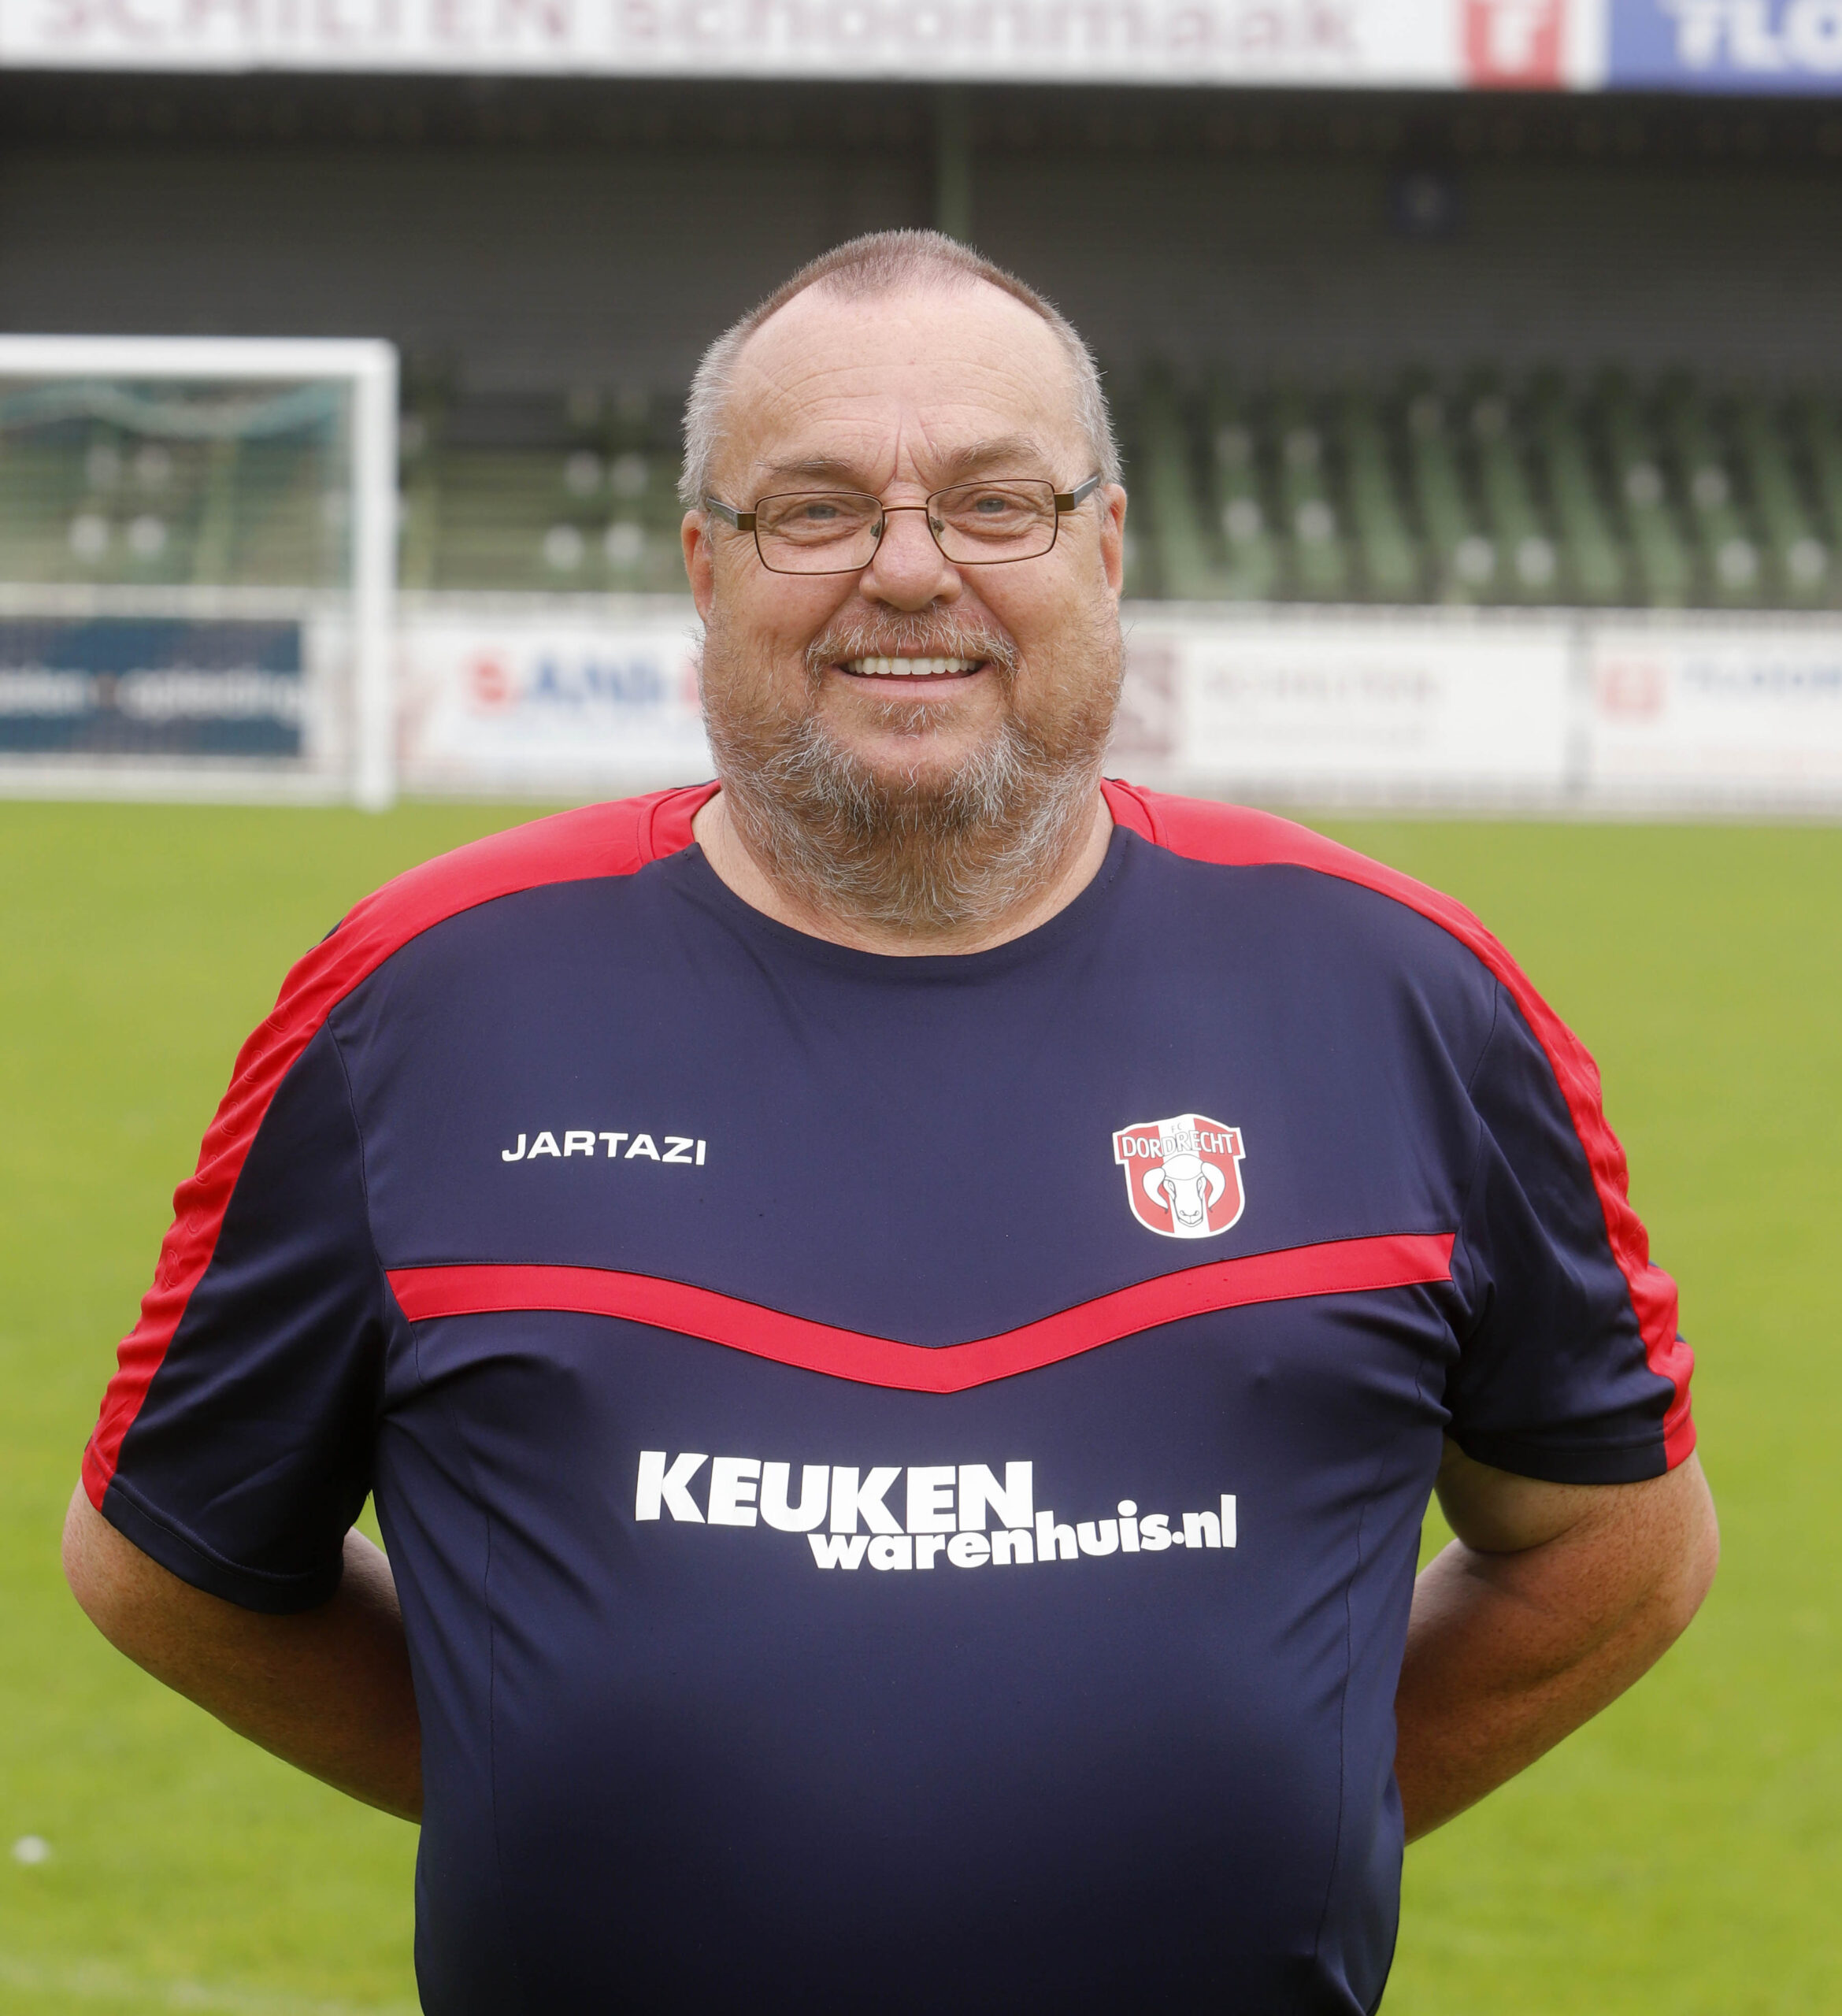 Jan van Zadelhoff